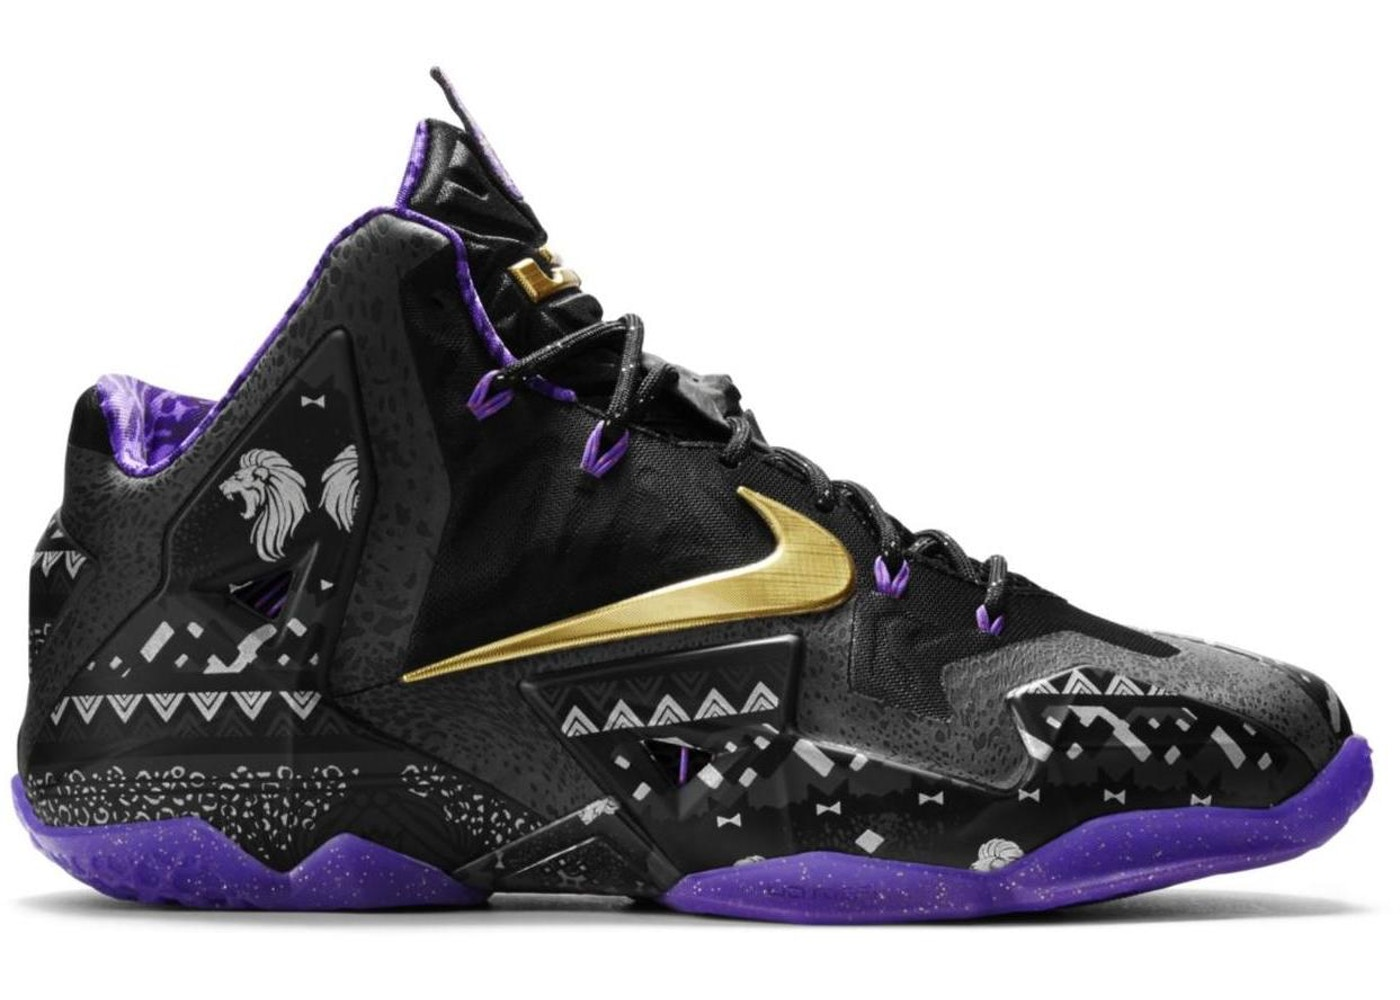 newest 7a397 e9f84 Nike LeBron 11 Shoes - Average Sale Price